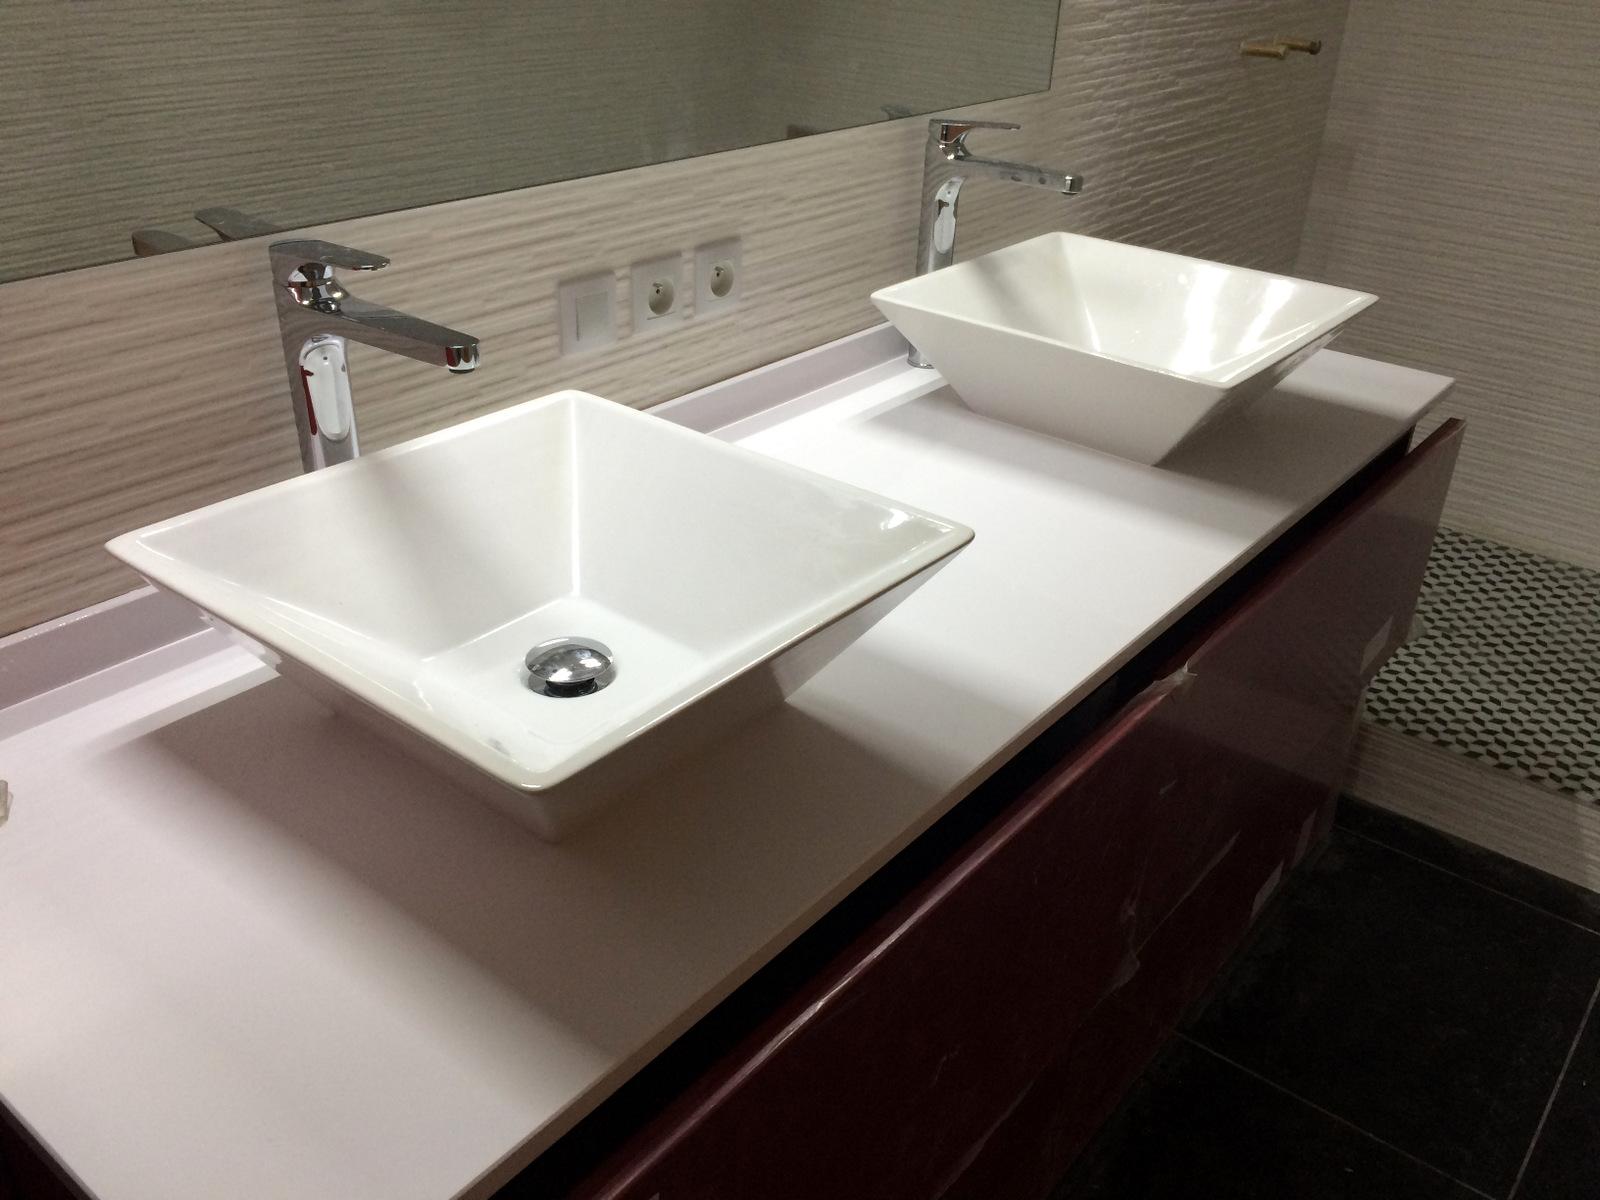 Ikea Dijon Salle De Bain ~ Plan De Travail Blanco Zeus Bordeaux Hm Deco